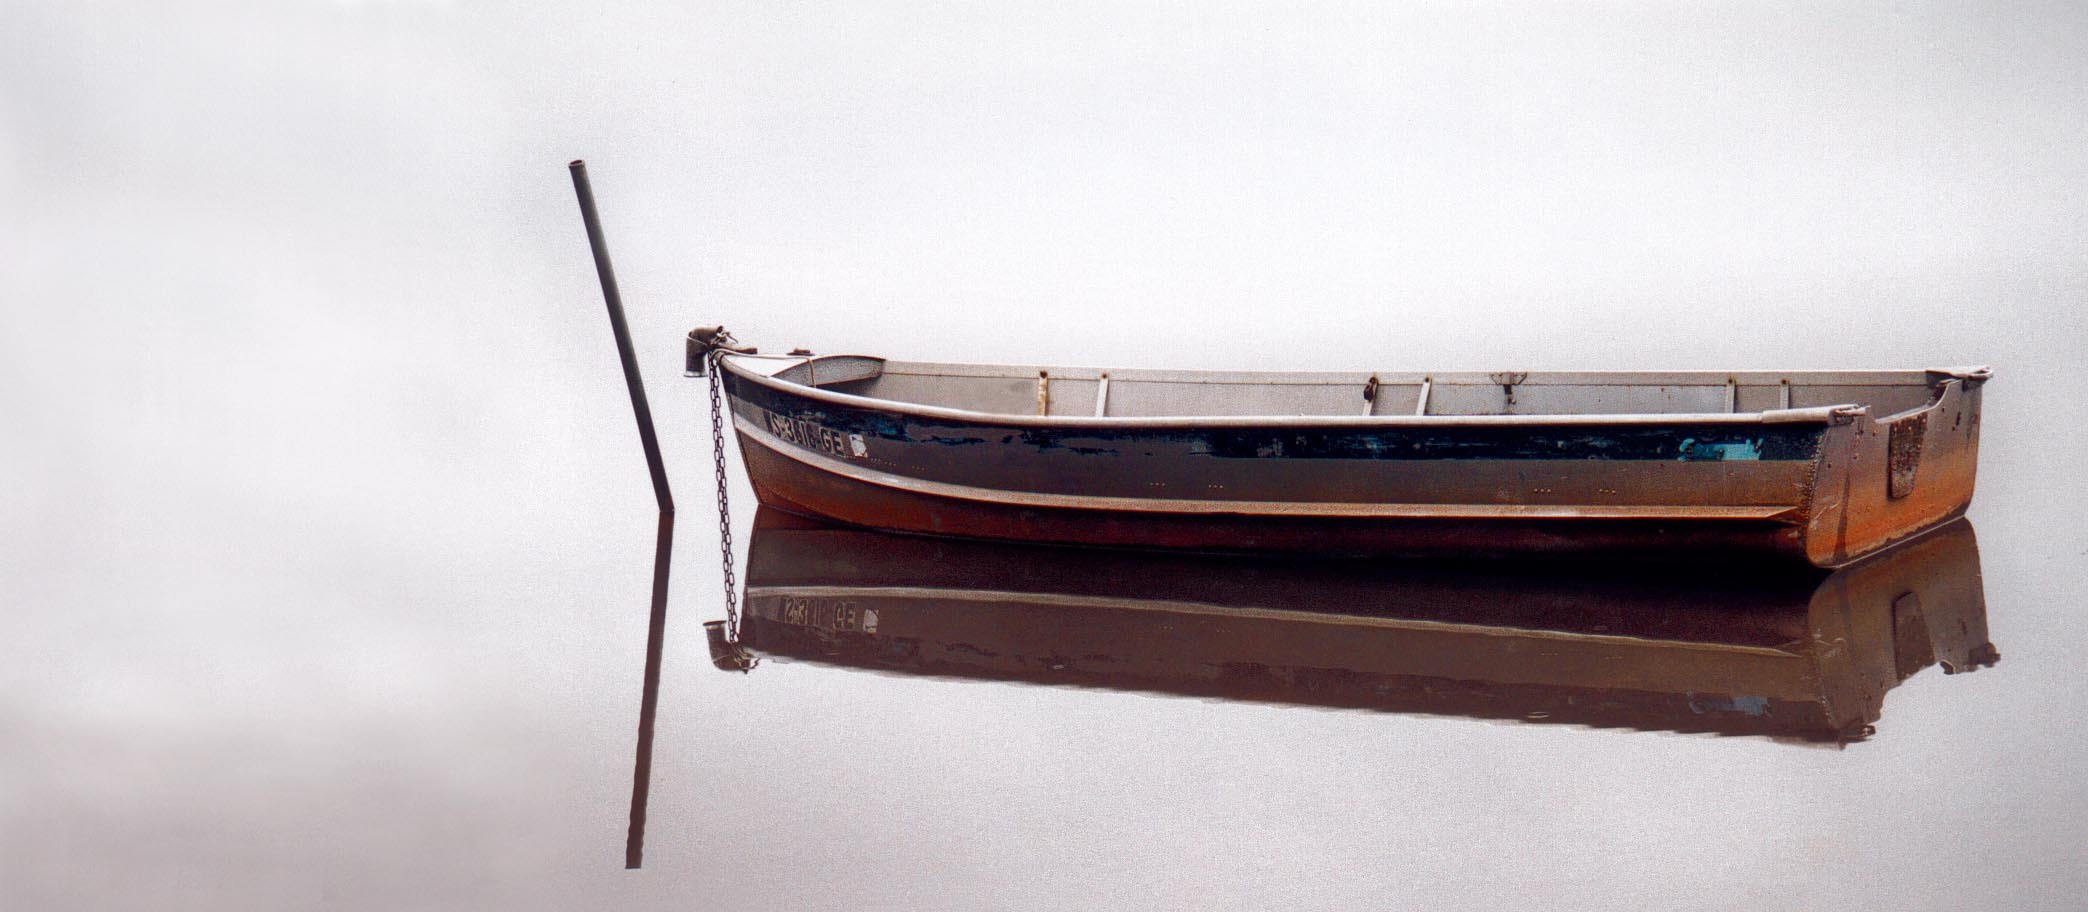 newboat.jpg